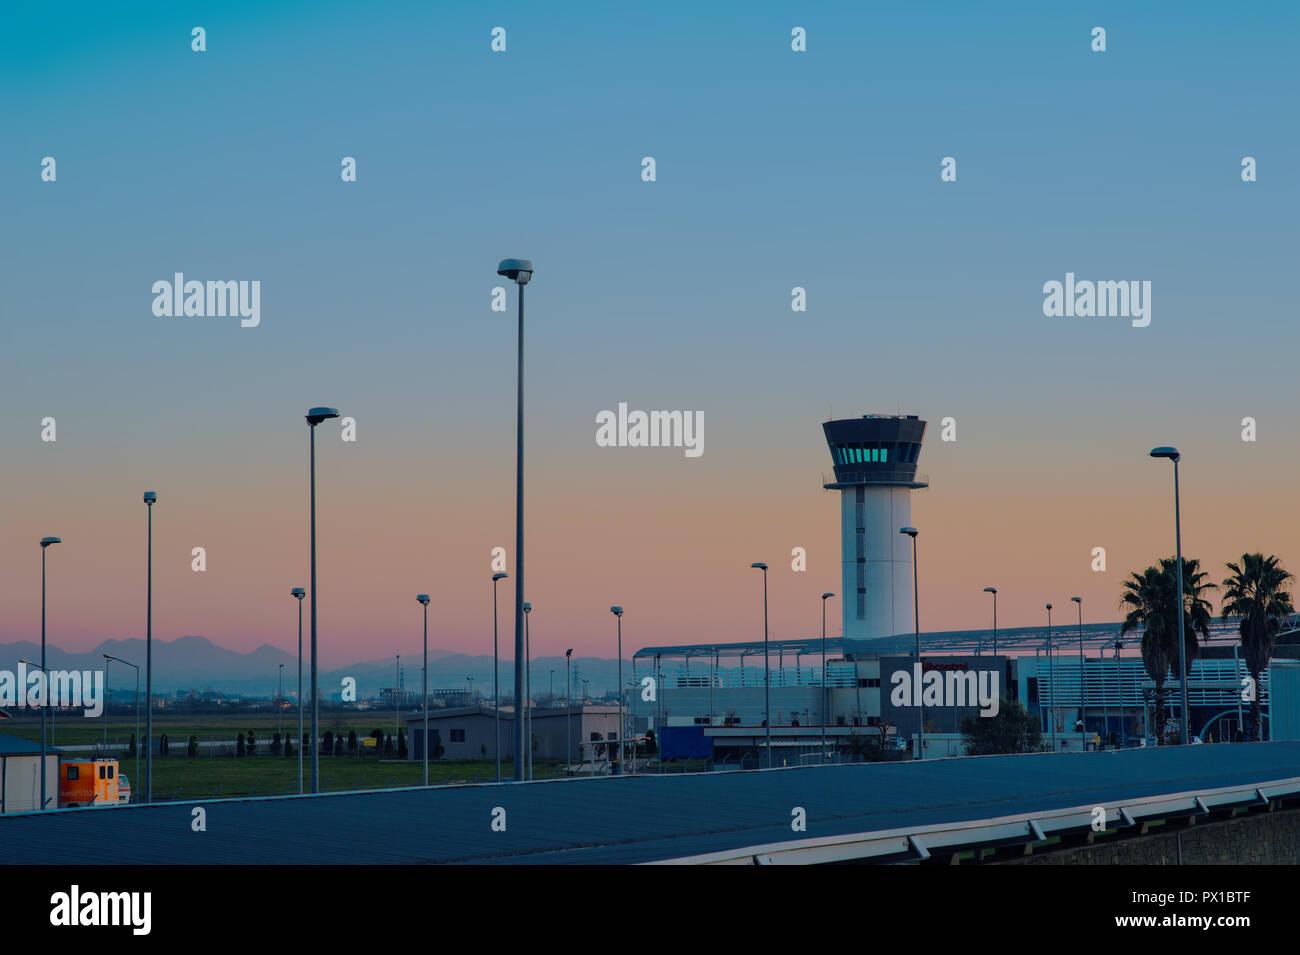 Tirana, Albania - December 2014: Tirana International Airport Nene Tereza, commonly Rinas International Airport - Stock Image